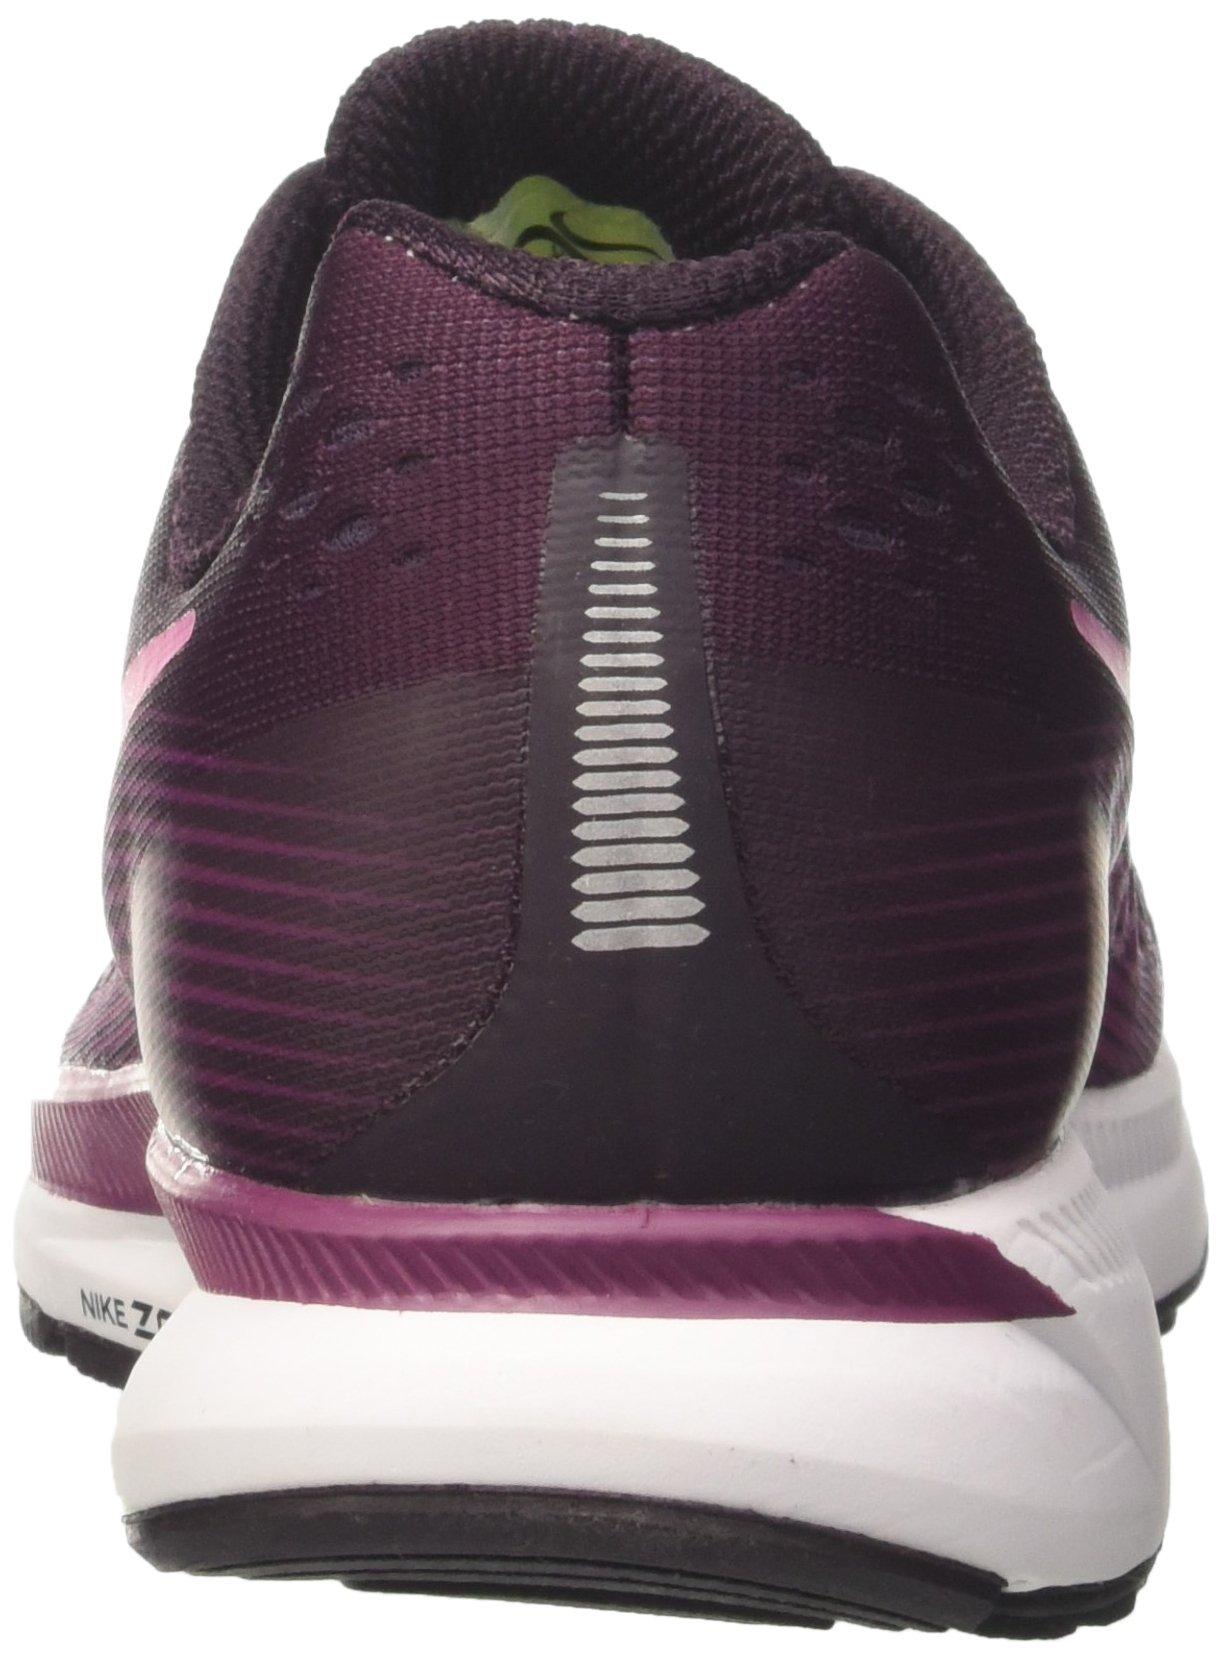 NIKE Women's Air Zoom Pegasus 34 Port Wine/Deadly Pink Running Shoe 7 Women US by NIKE (Image #2)